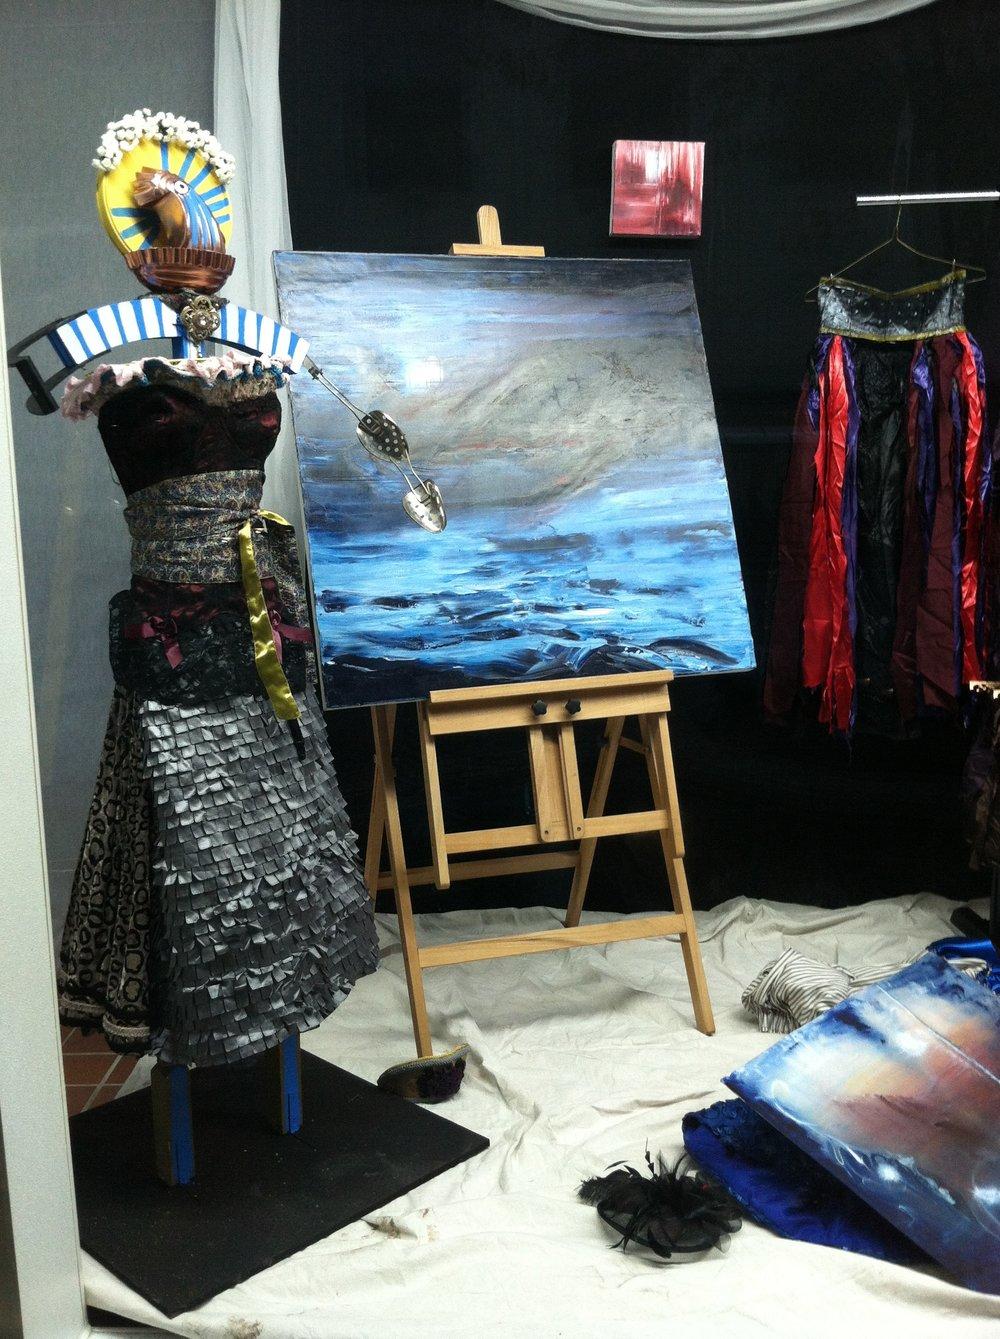 Collaborative installation between Inda Blatch-Geib and Alice Klock.